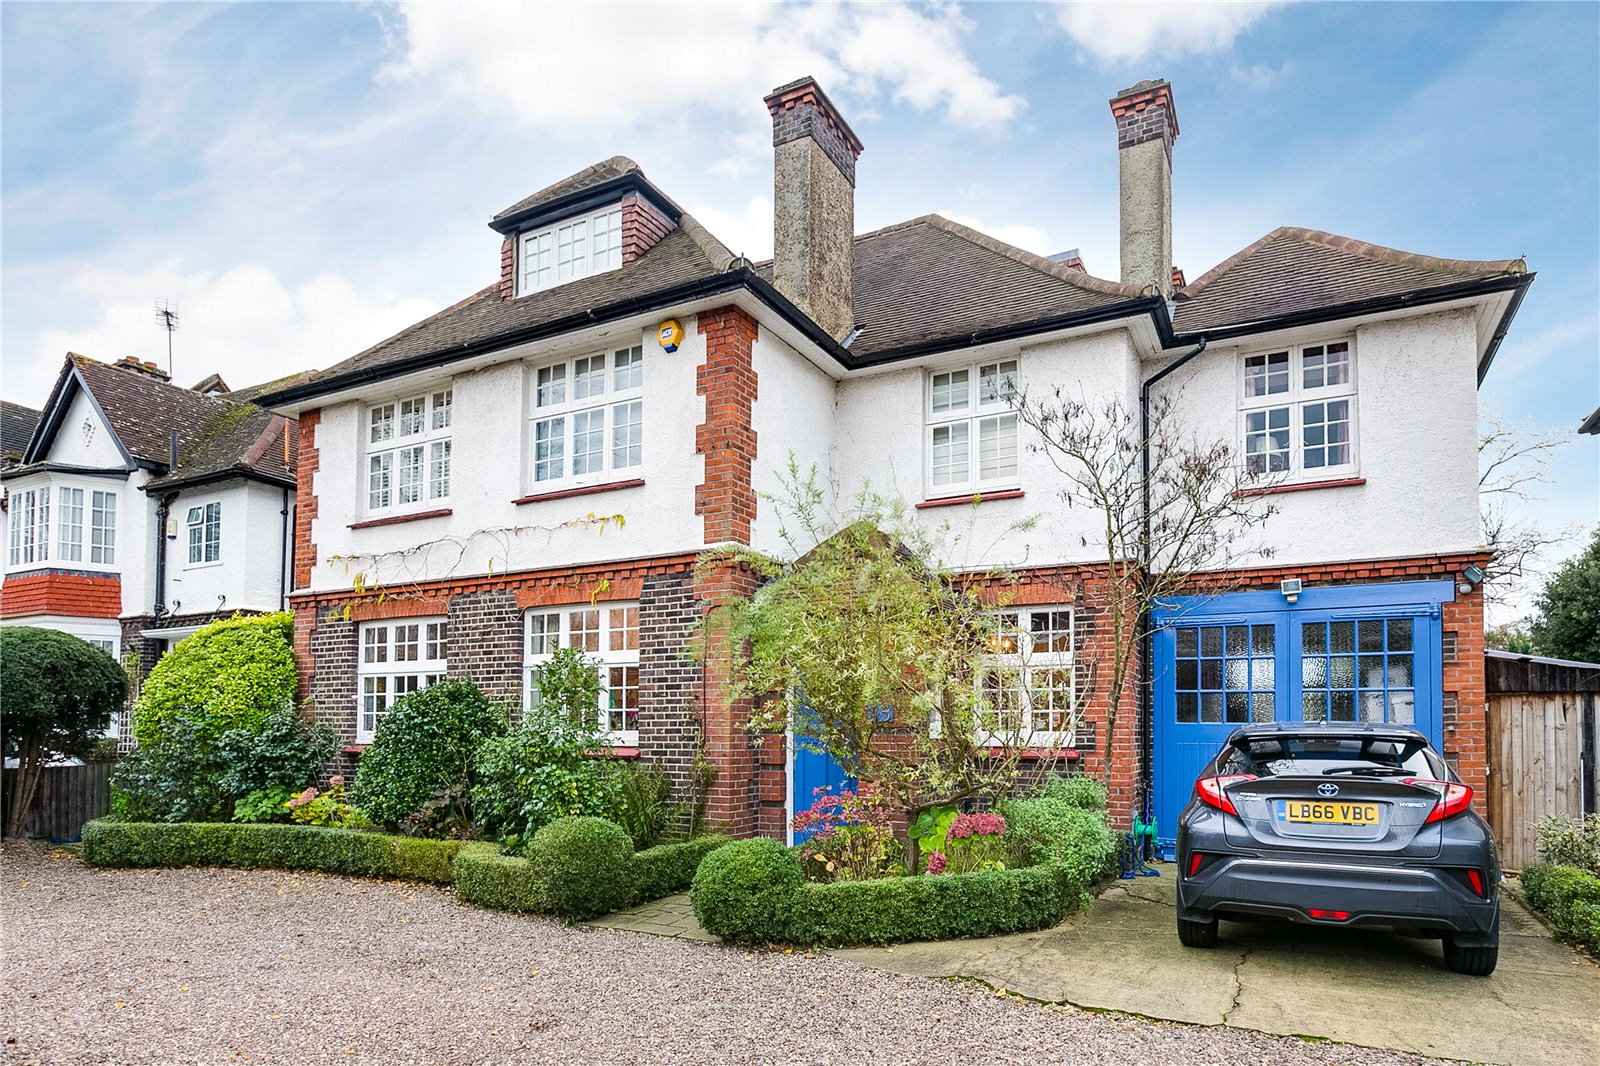 6 bedroom detached house for sale million pound homes for sale uk